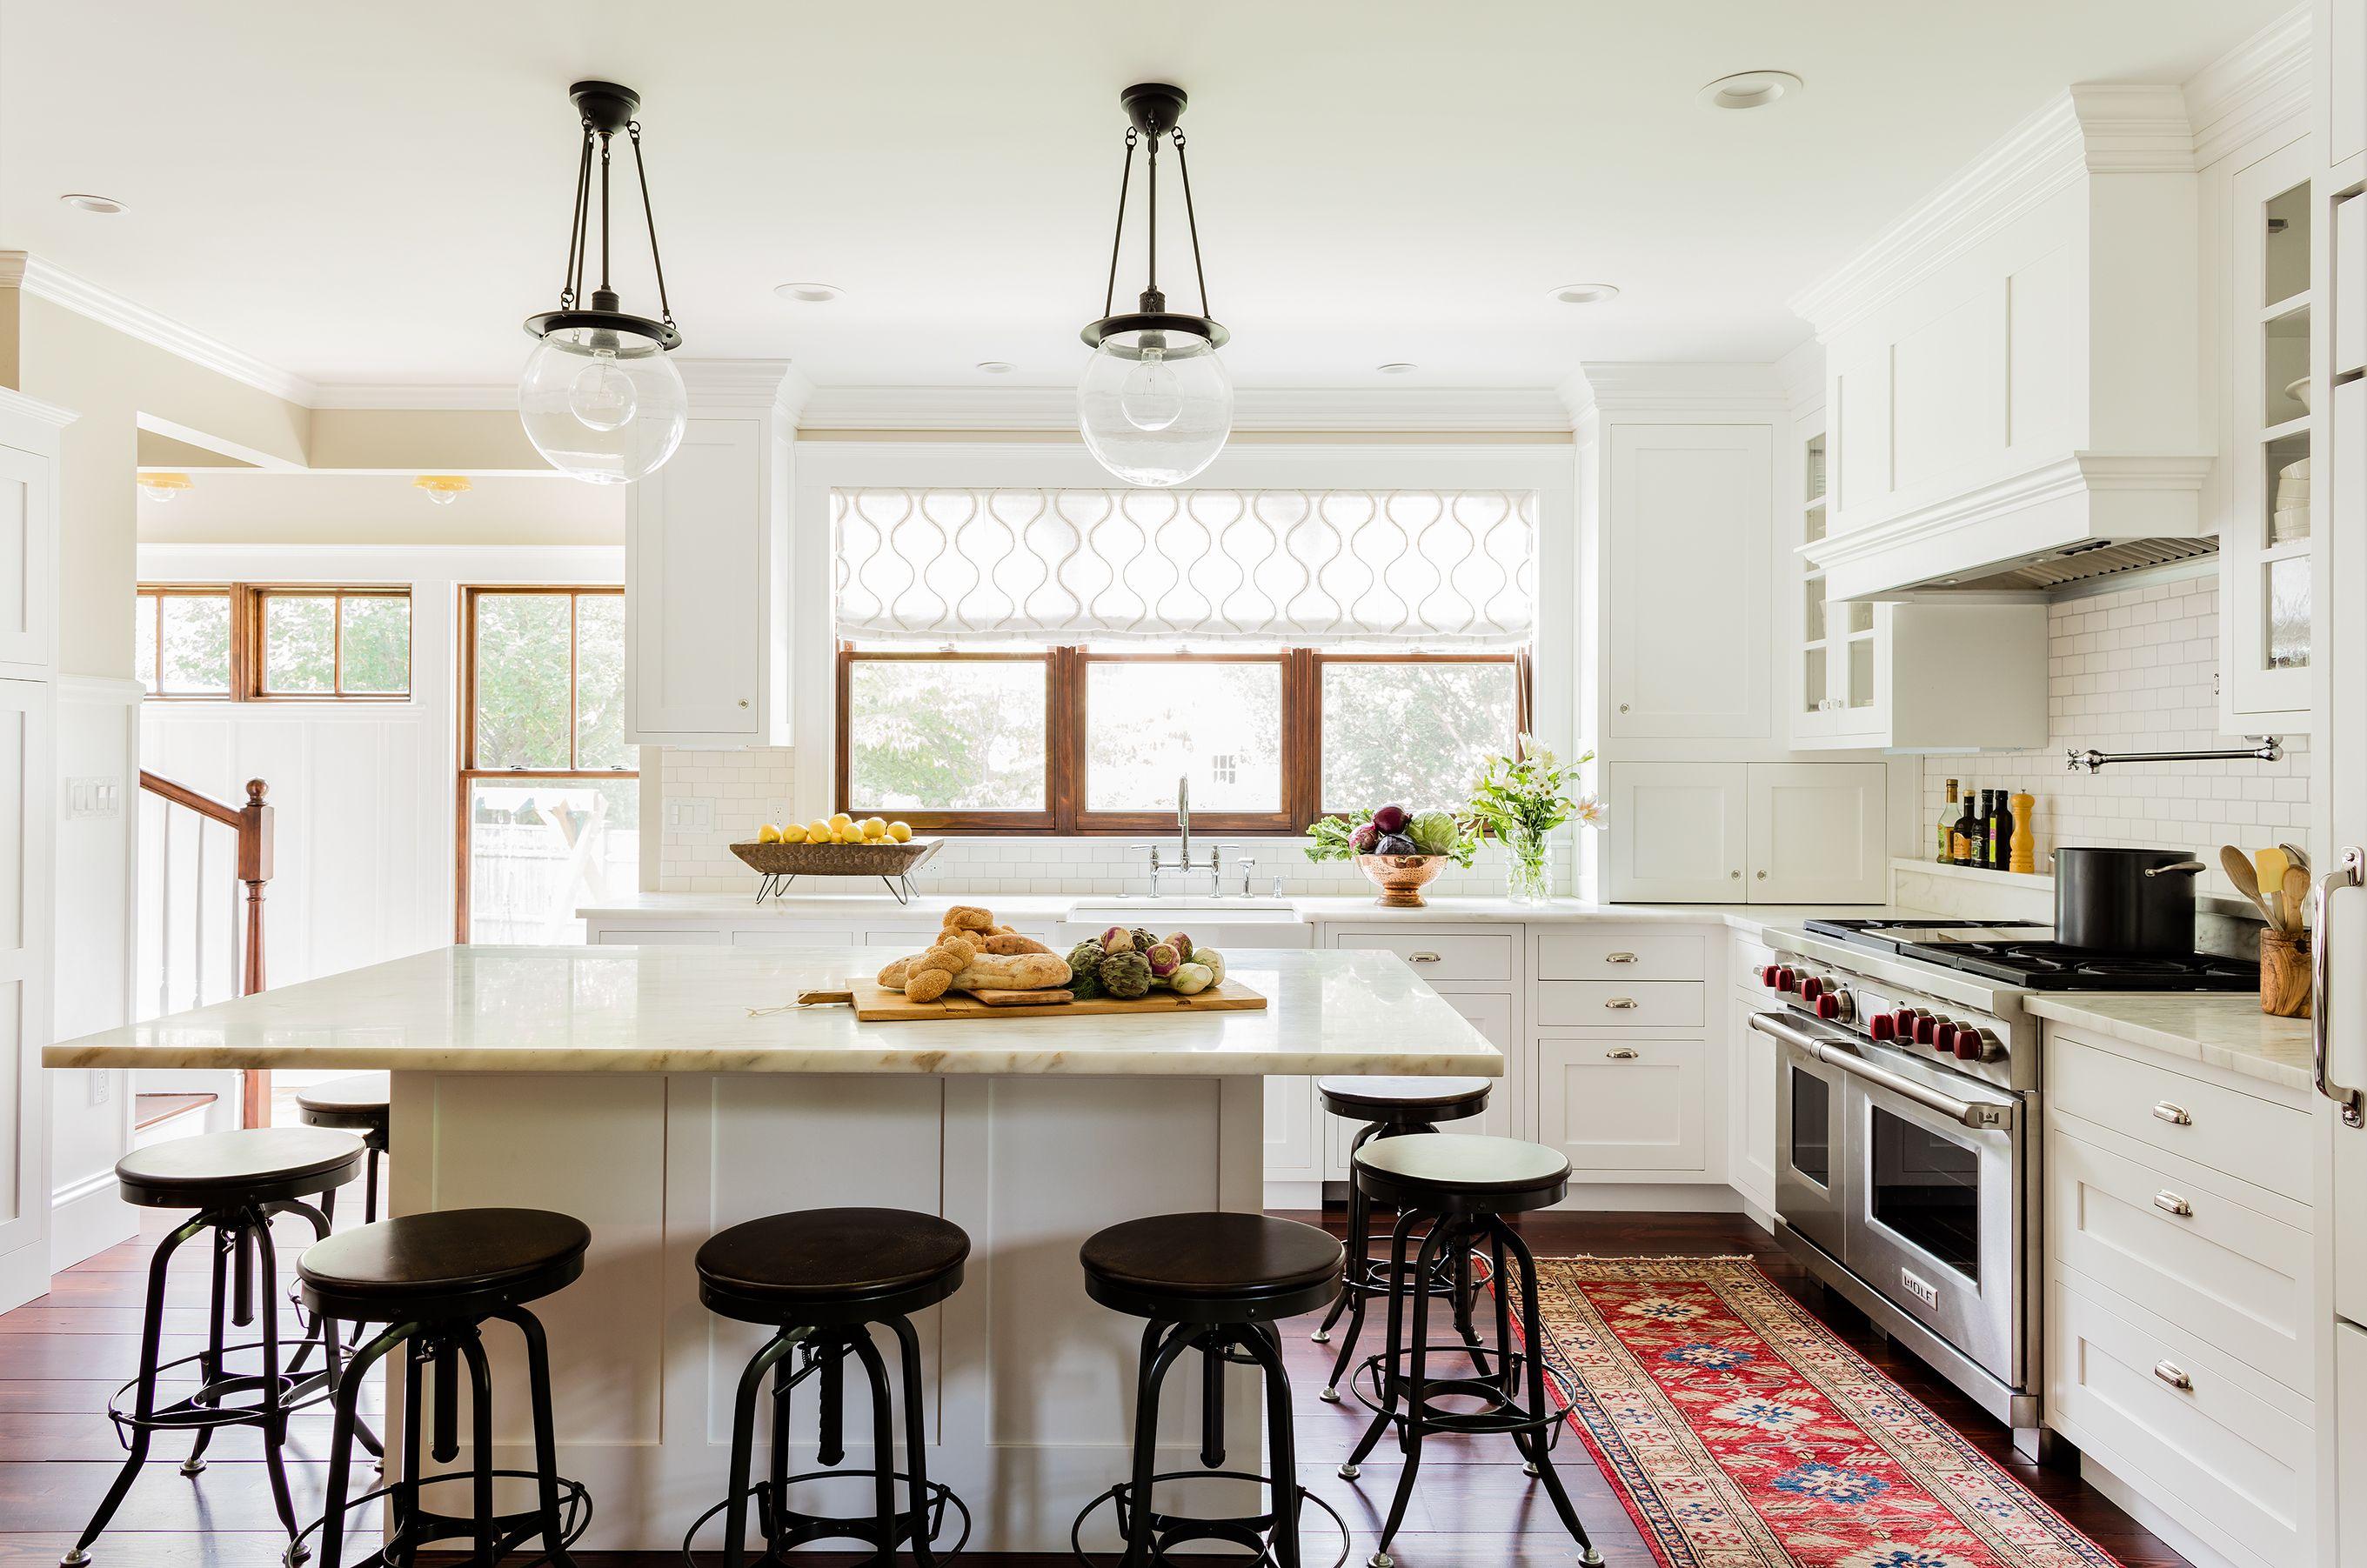 Kitchen designed by Kathy Marshall of K.Marshall Design ...